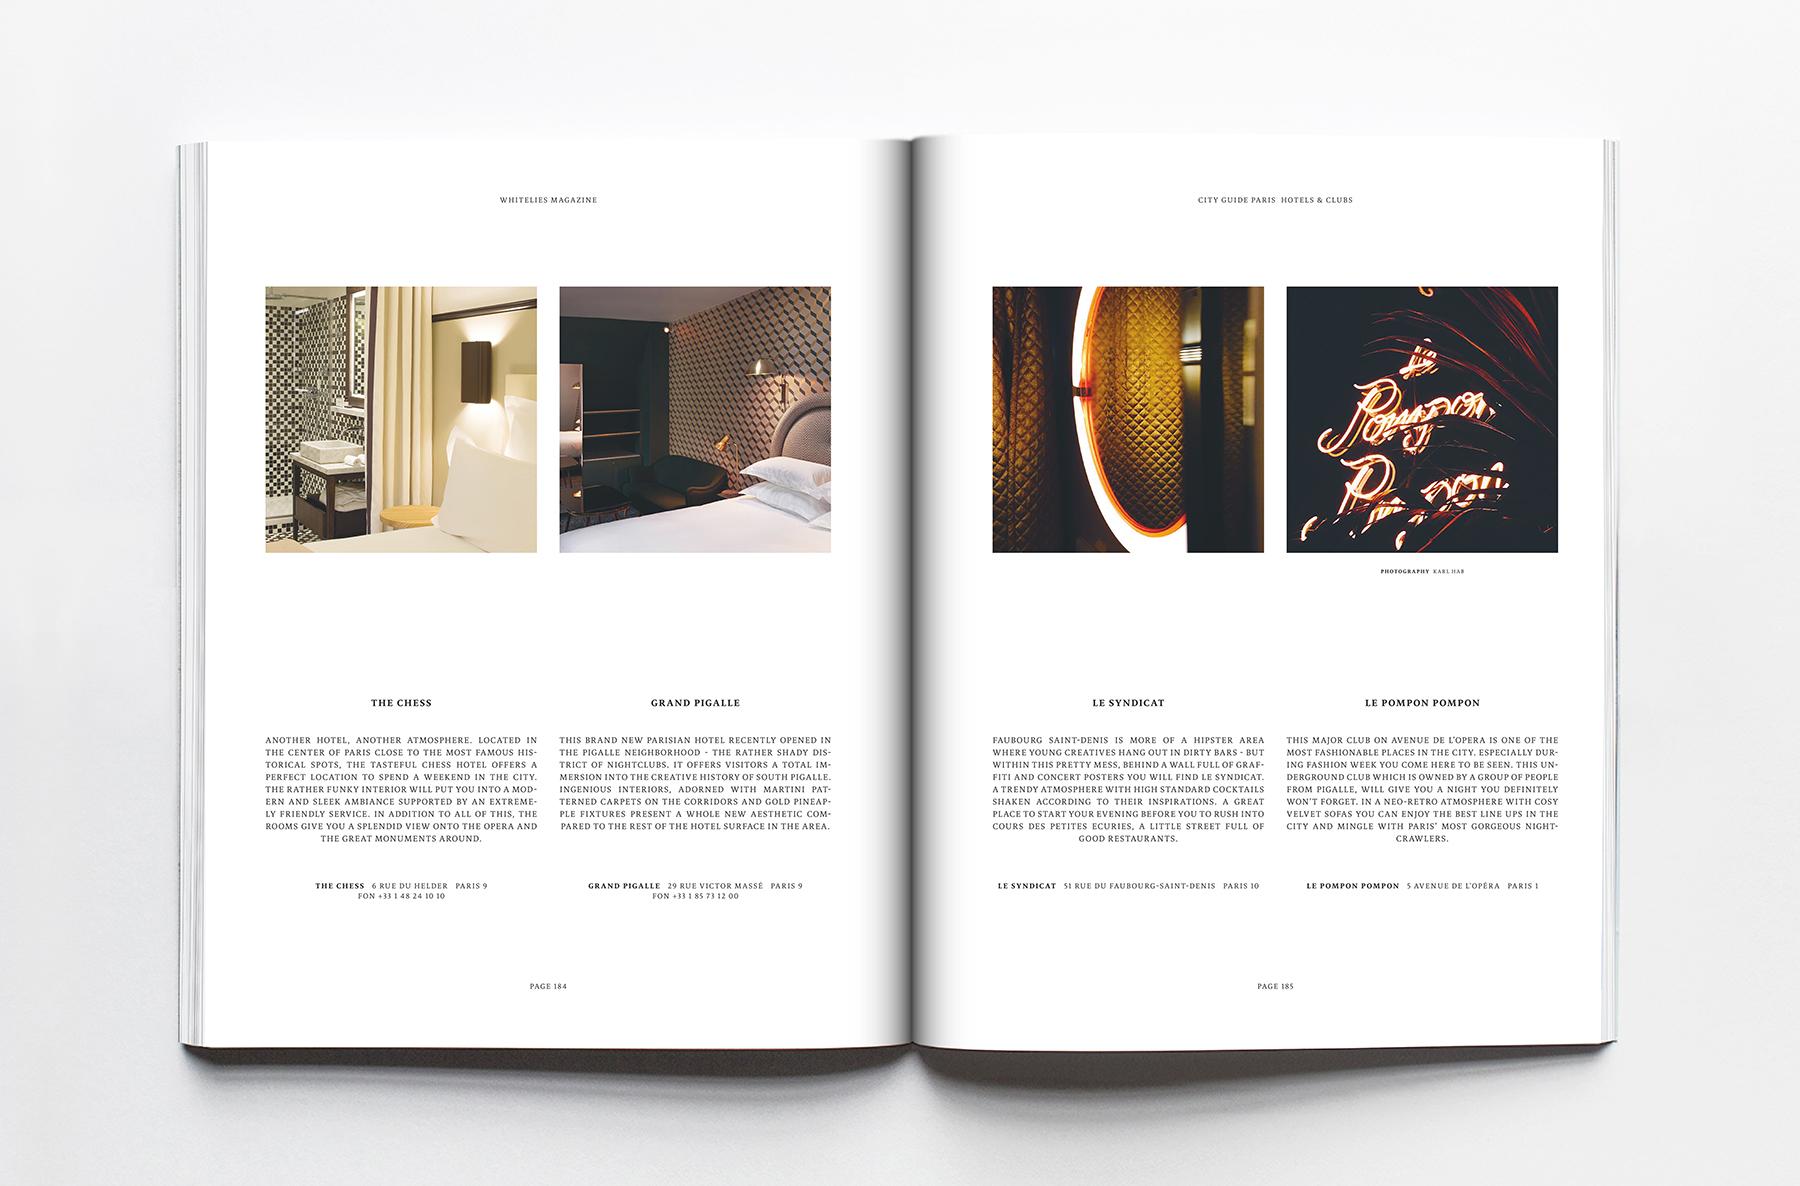 wla_magazine_38.jpg